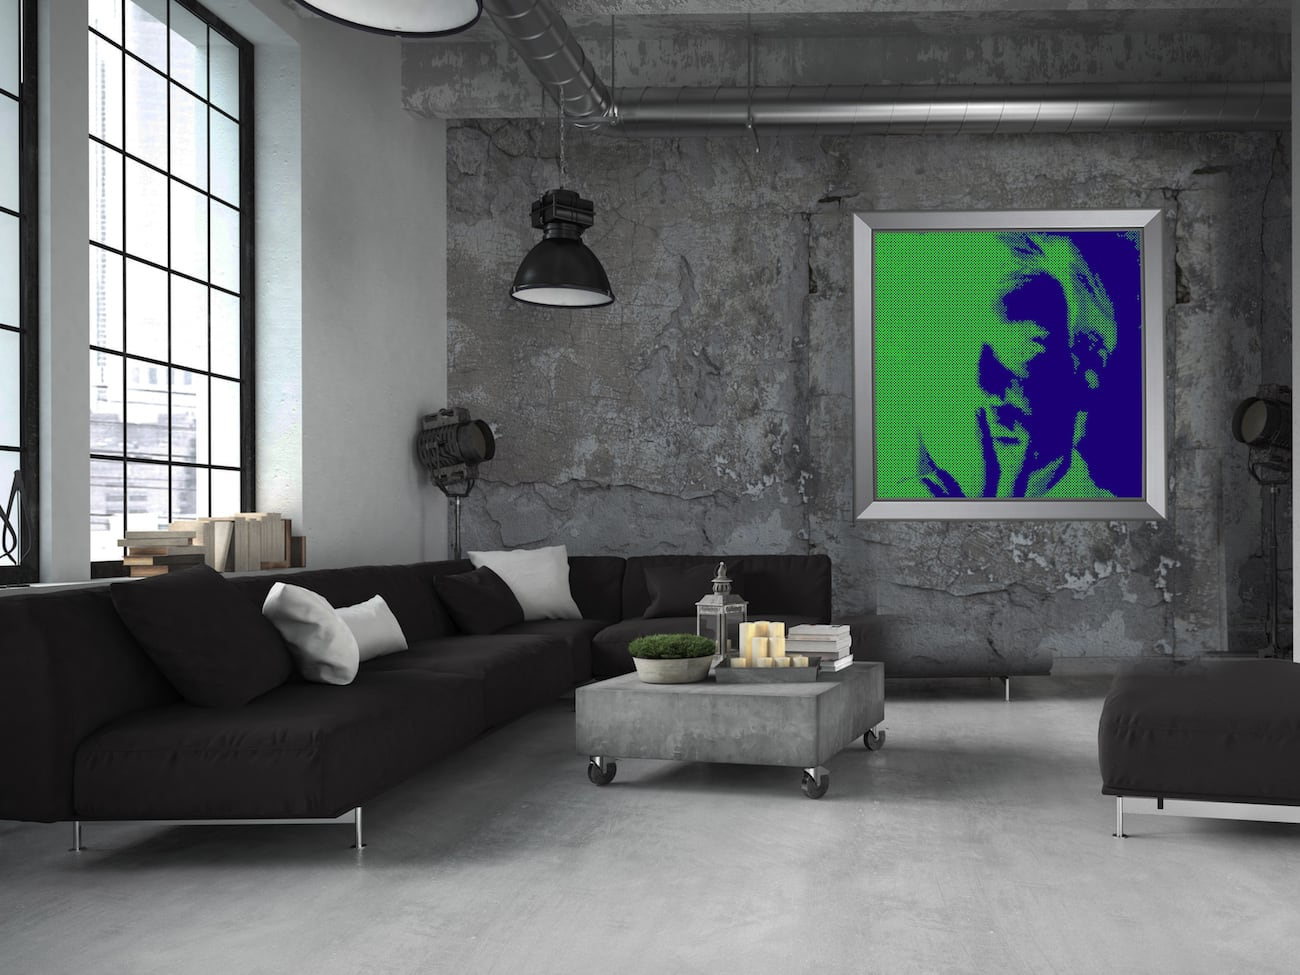 Illumi Arts Bluetooth Luminous LED Artwork